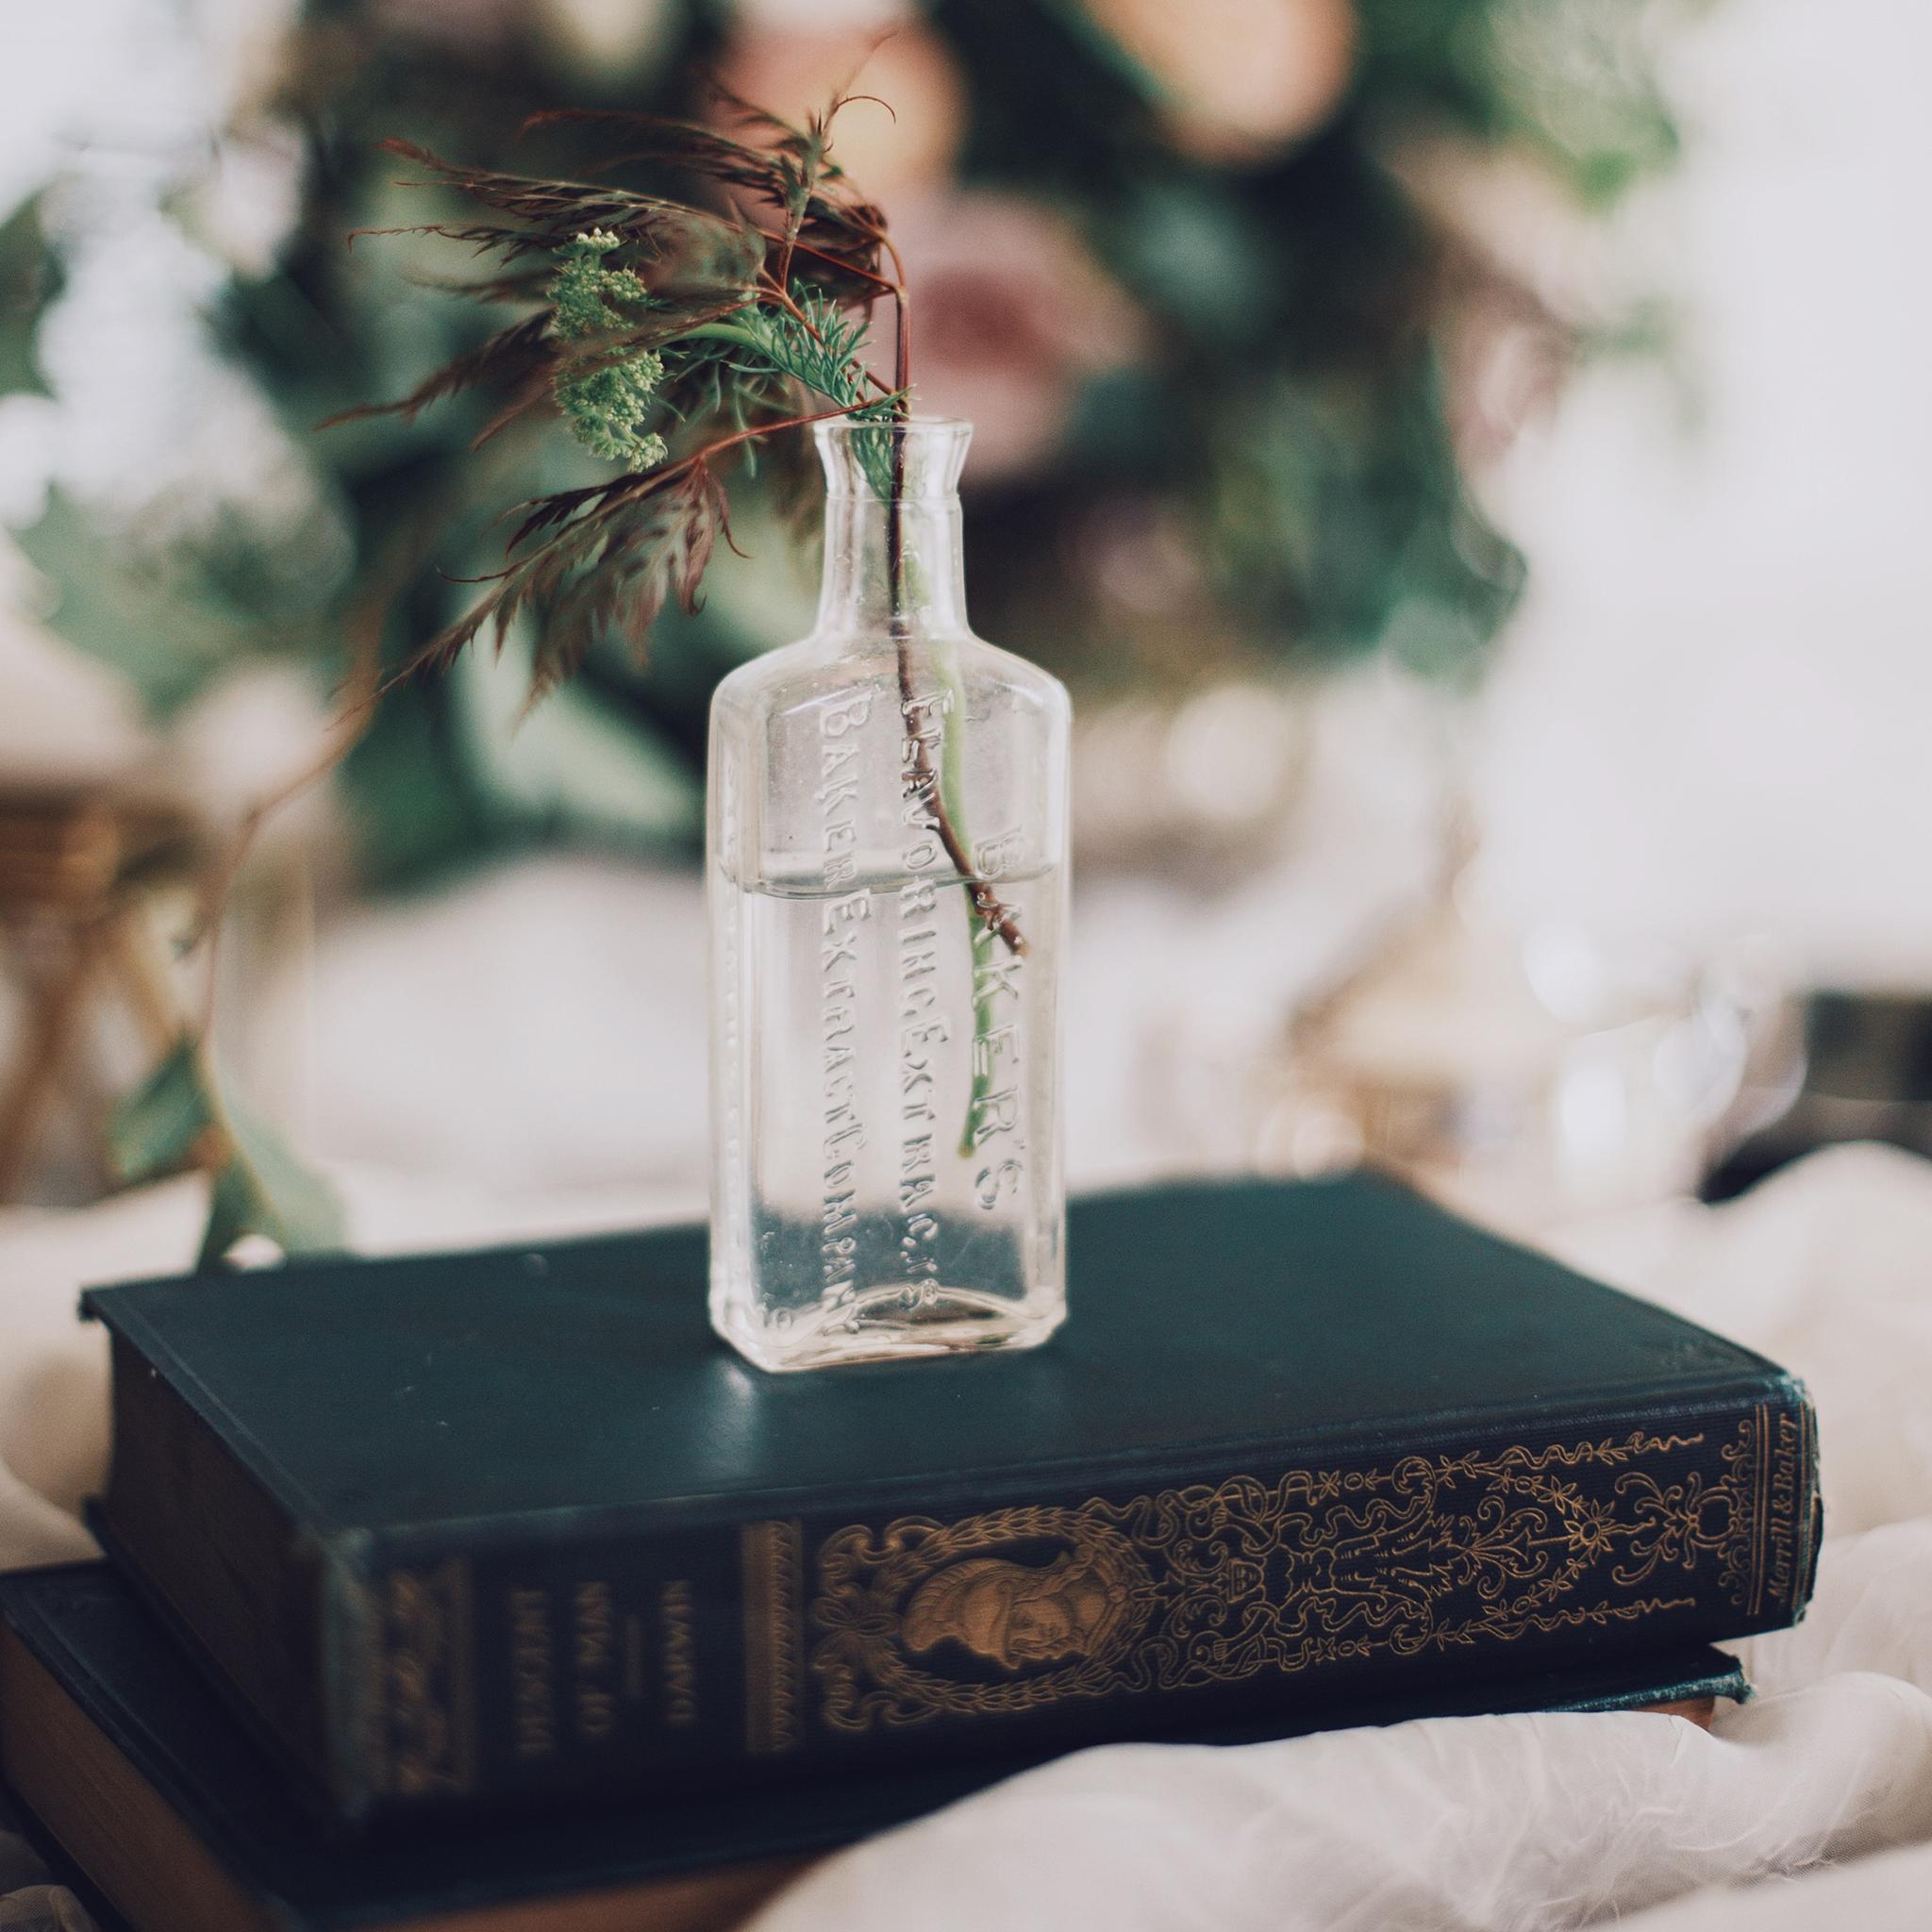 Club de lecture - Grands classiques de la littérature